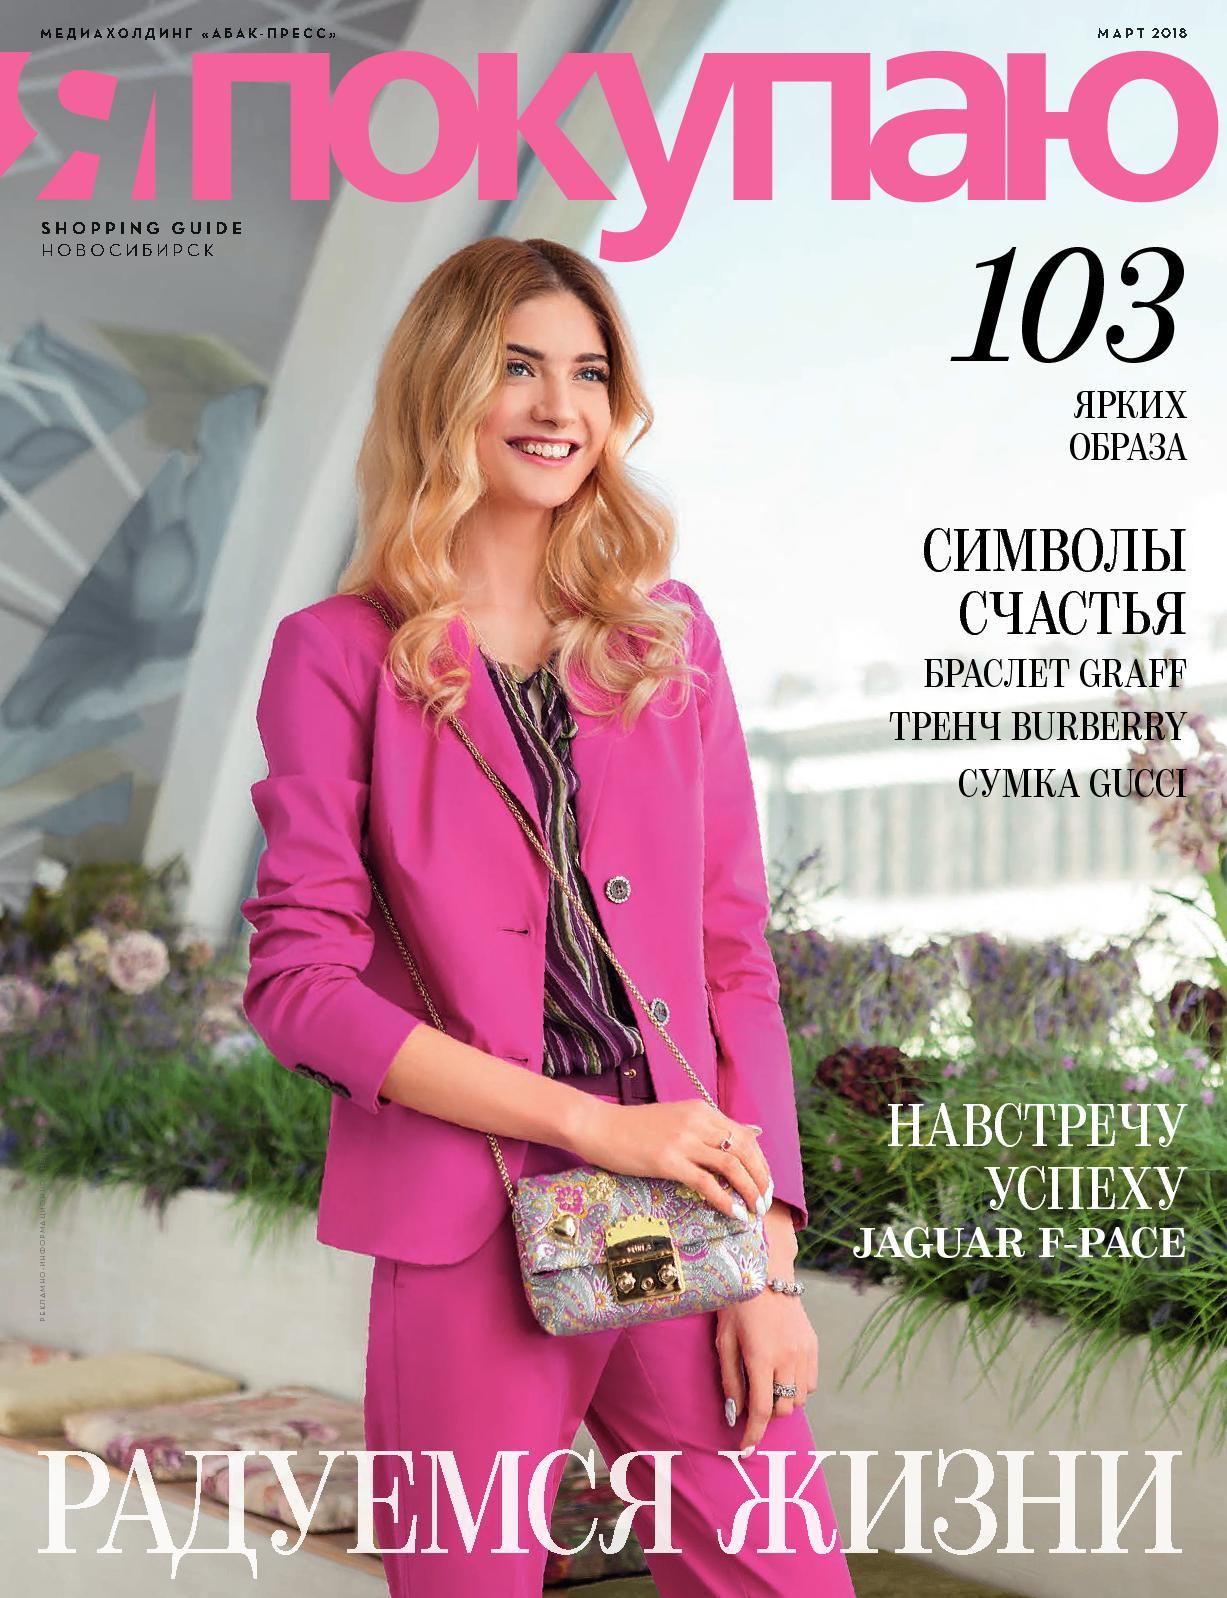 Журнал Shopping Guide «Я Покупаю» Новосибирск – Март 2018